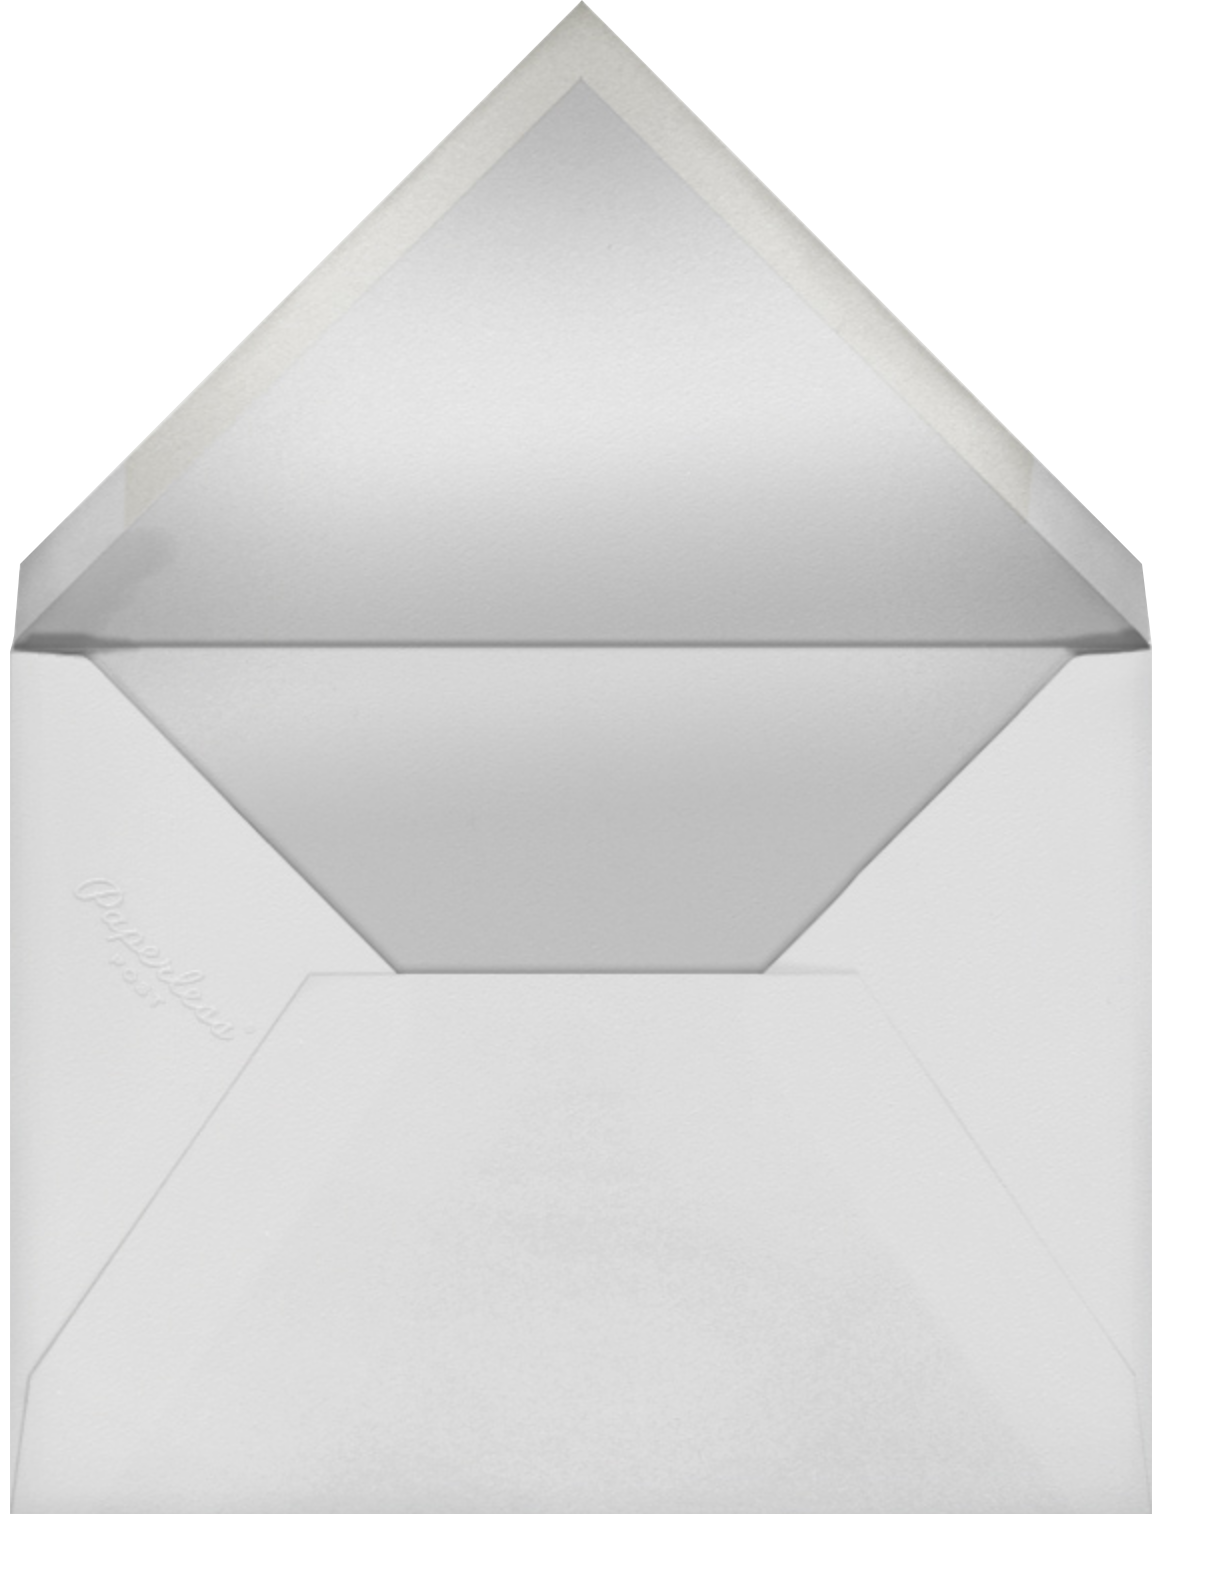 Editorial II (Menu) - White/Rose Gold - Paperless Post - Menus - envelope back